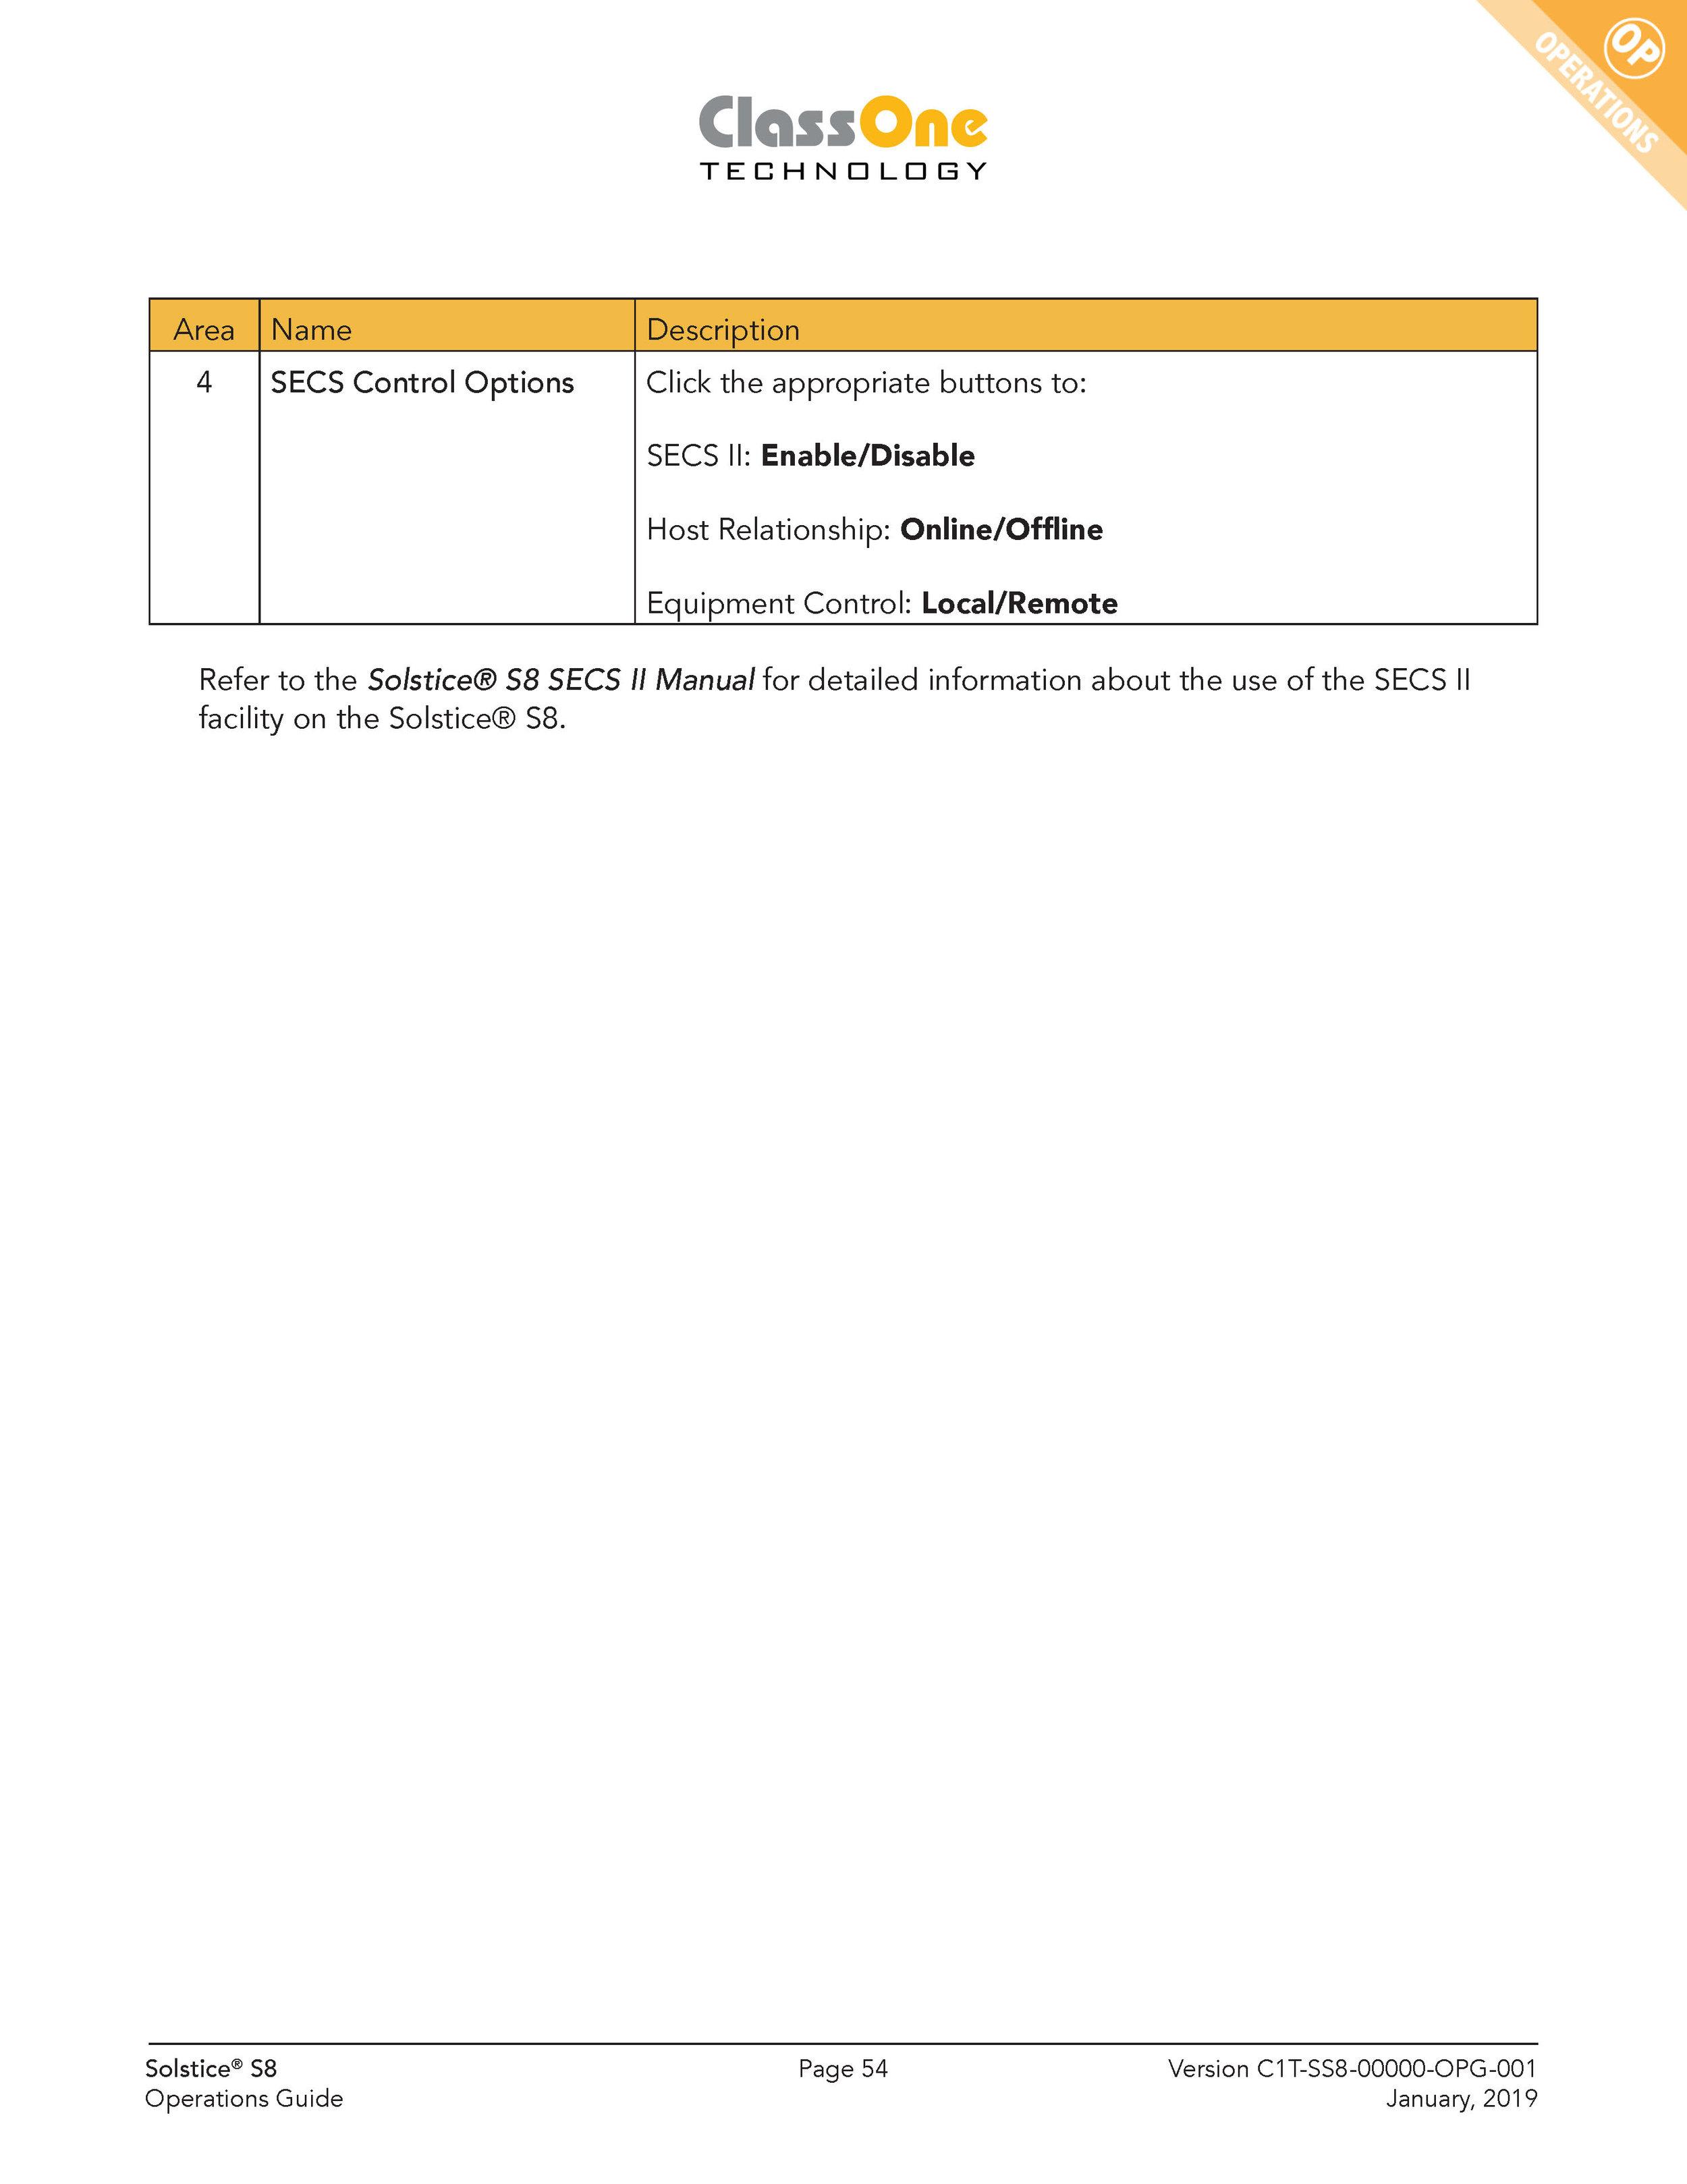 19-01-18 C1T-SS8-00000-OPG-001_Page_054.jpg